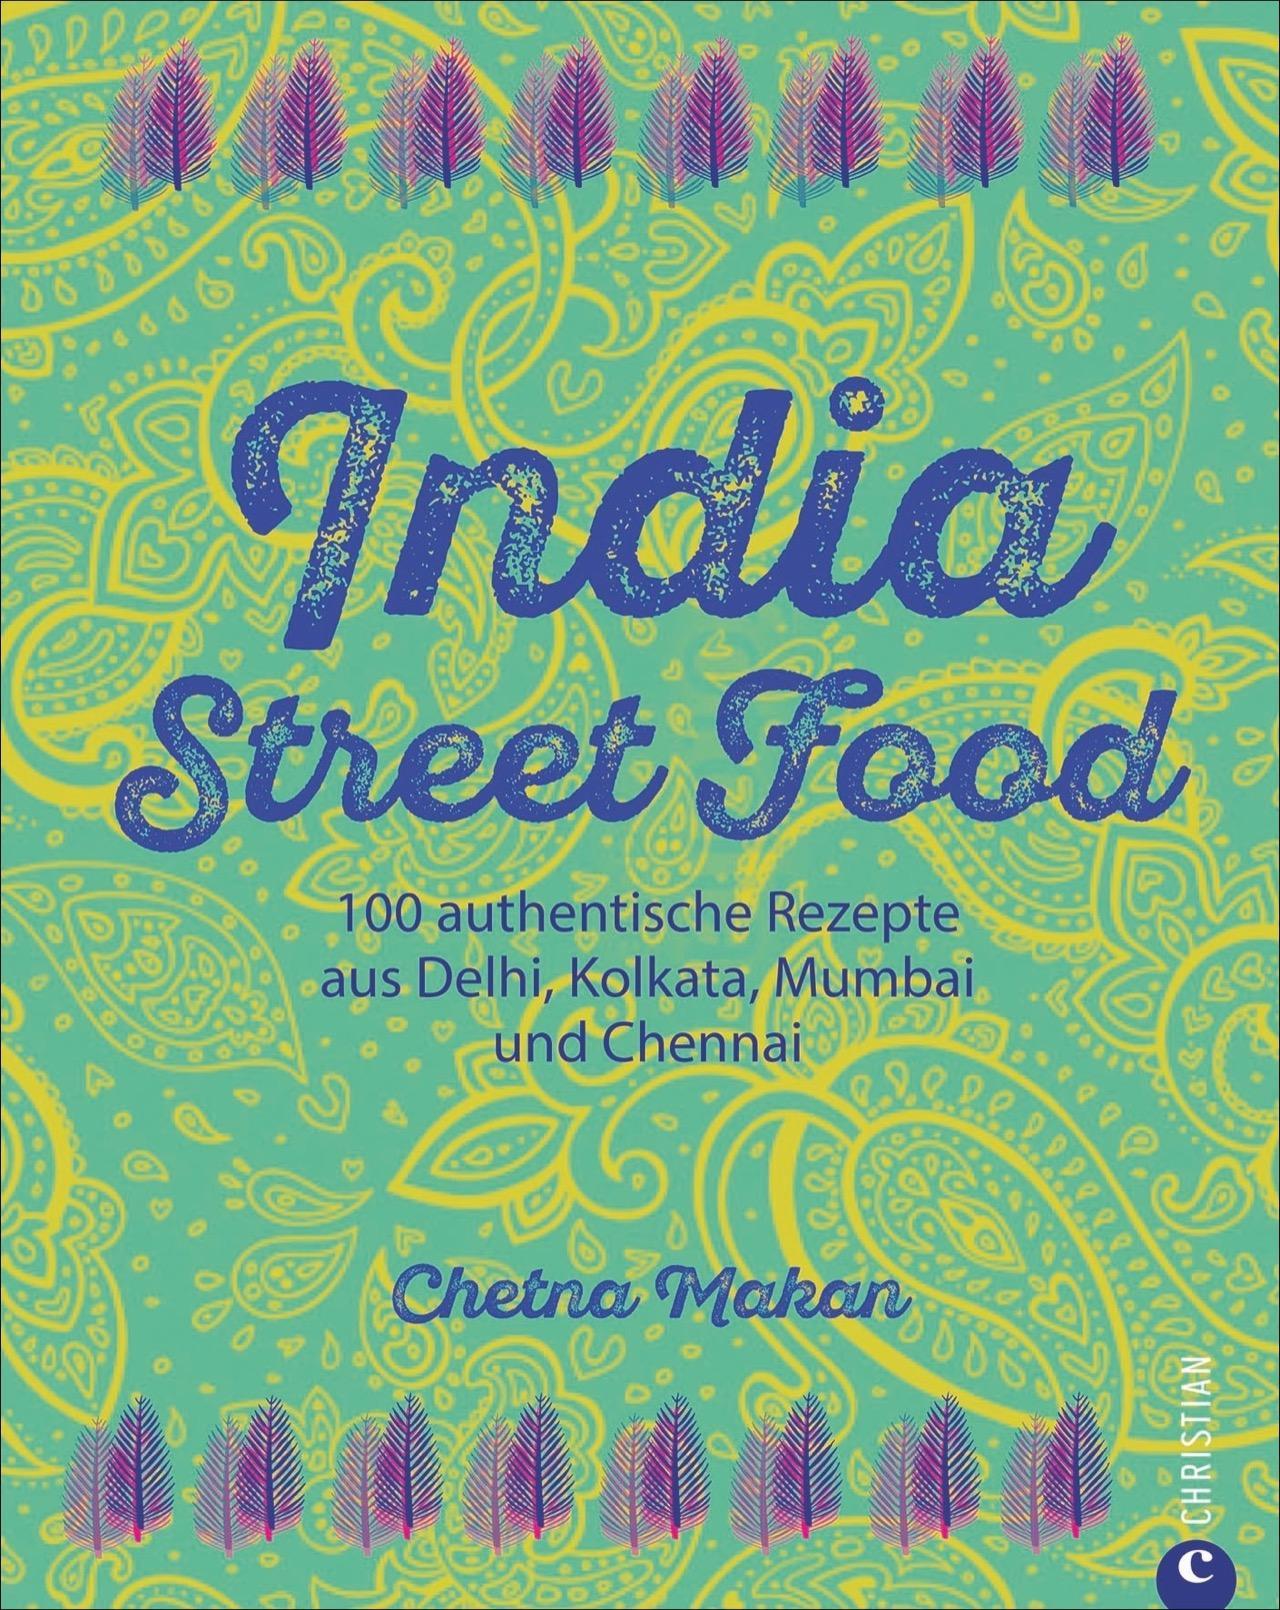 India Street Food  100 authentische Rezepte aus Delhi, Kolkata, Mumbai und Chennai  Chetna Makan  Buch  Deutsch  2017